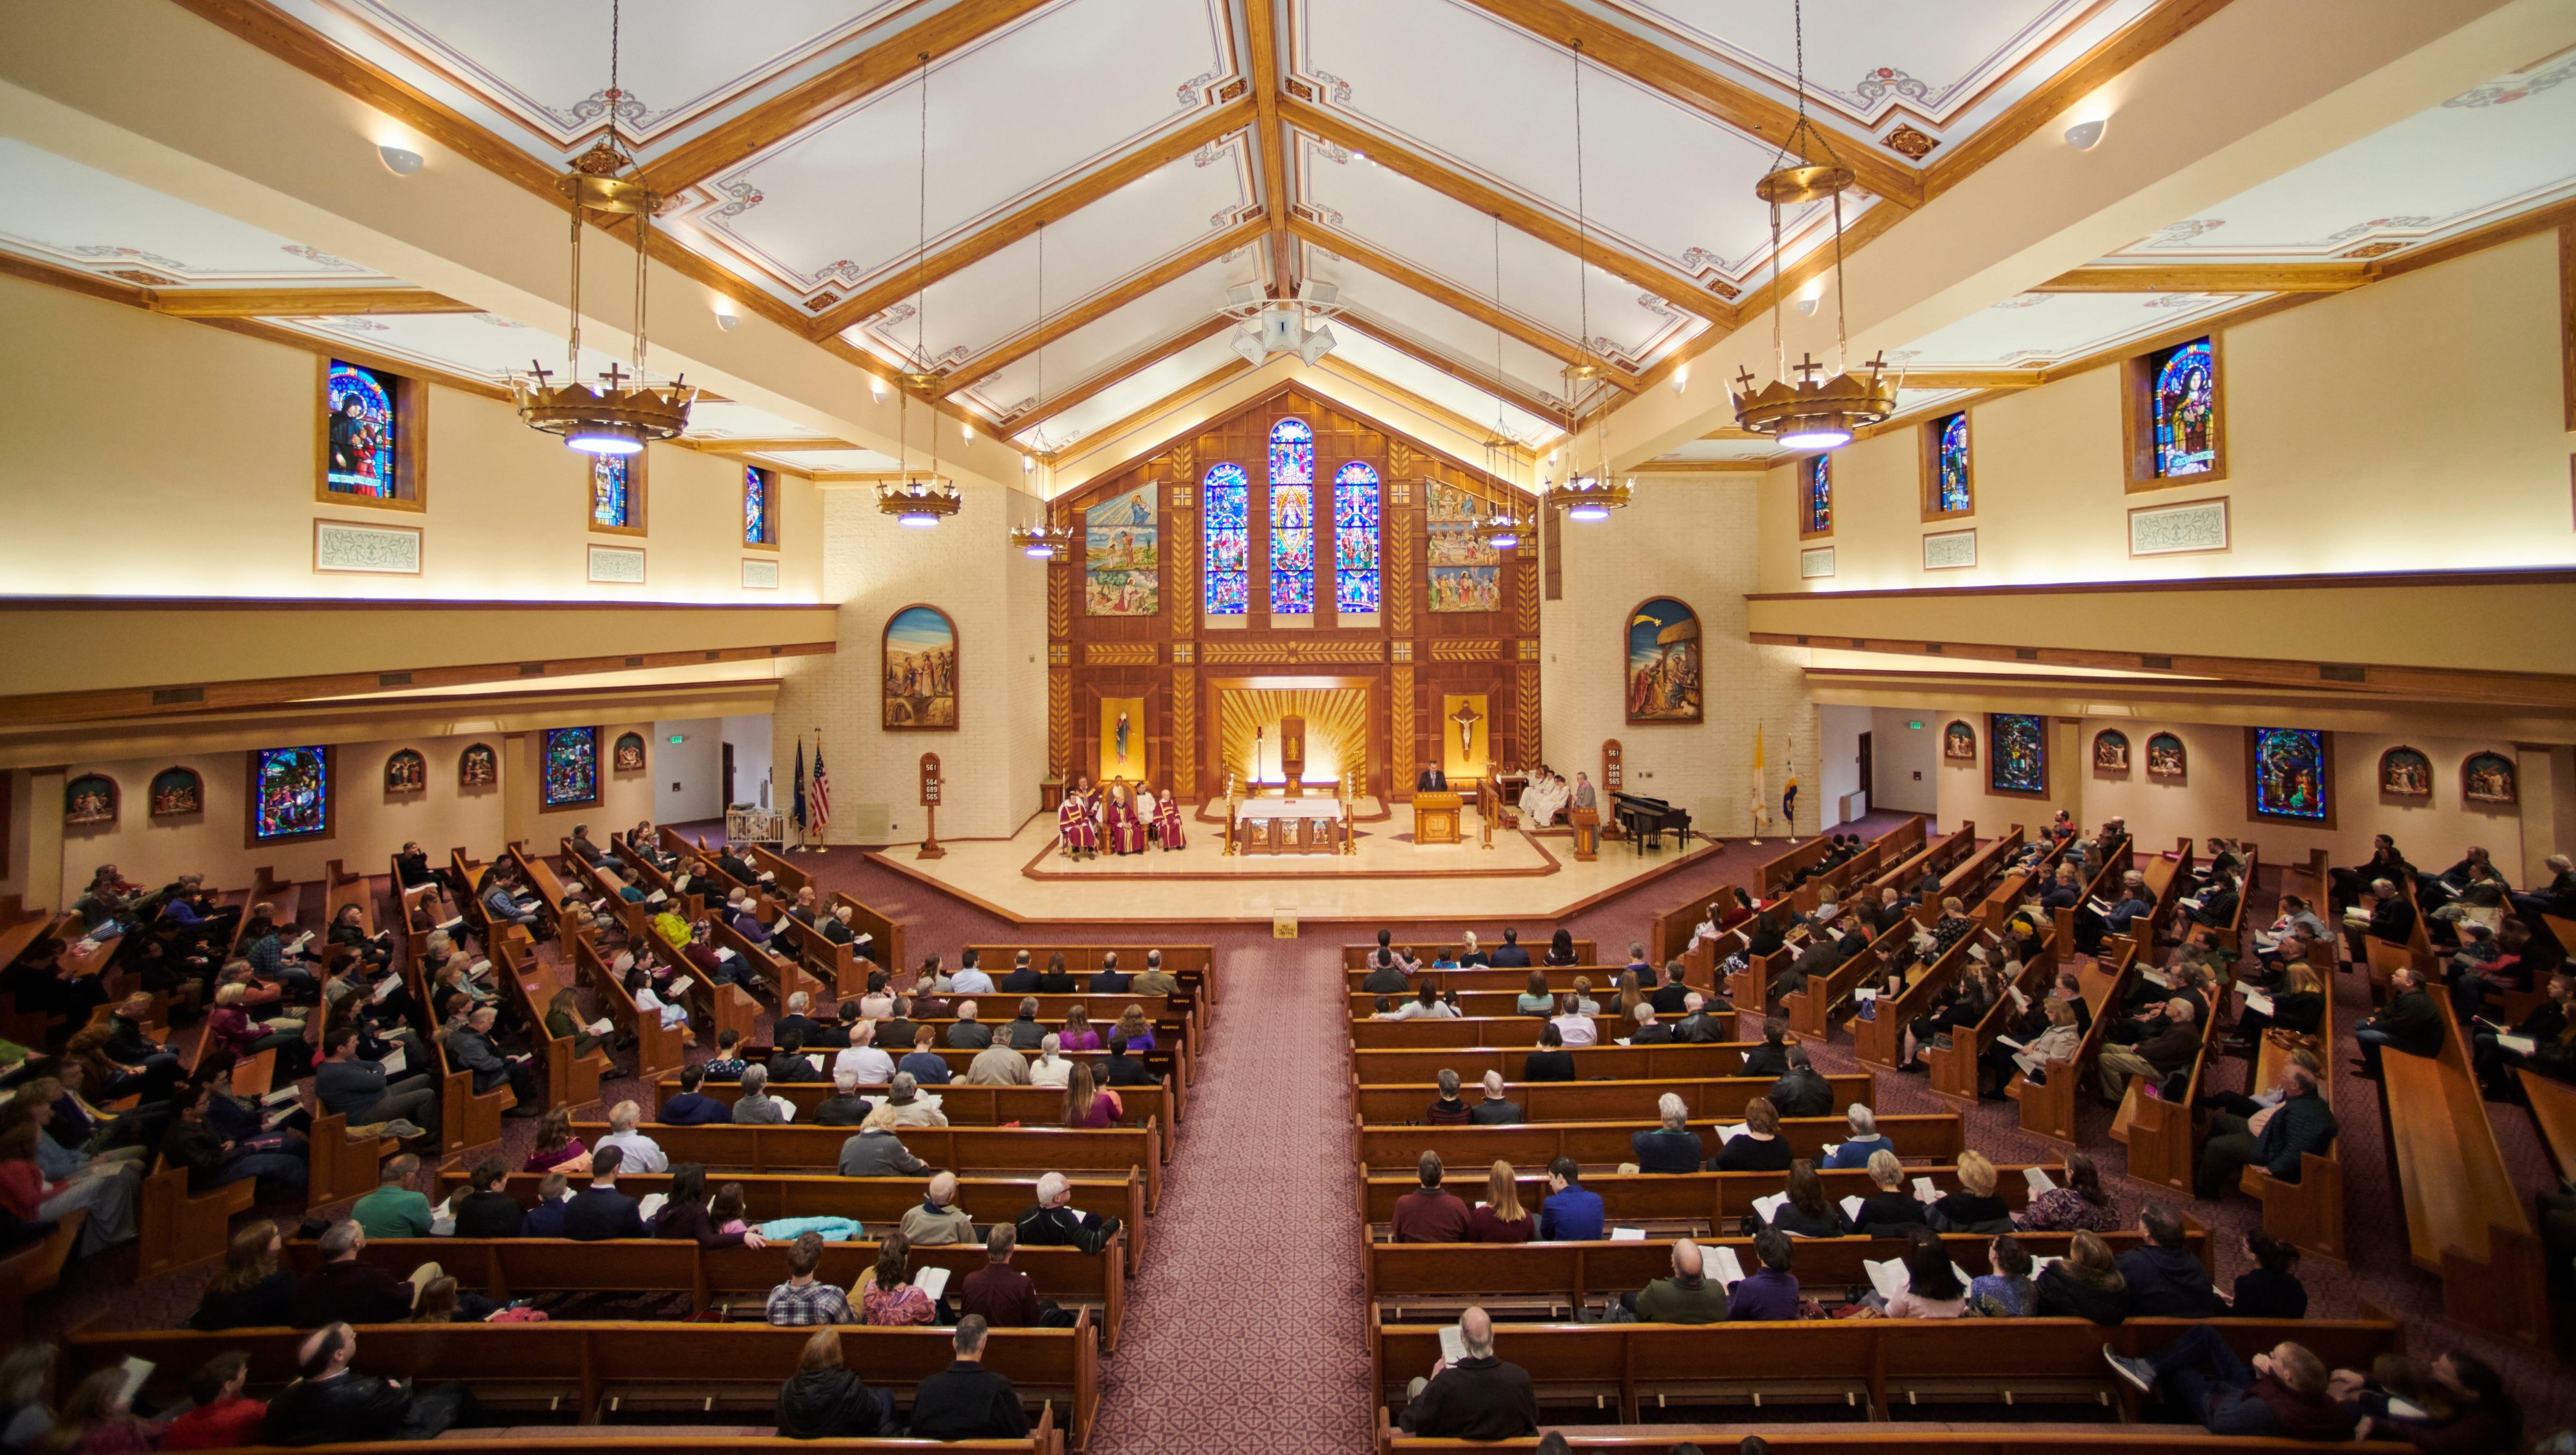 St Martha Parish Moves On As 5m Embezzlement Trial Awaits